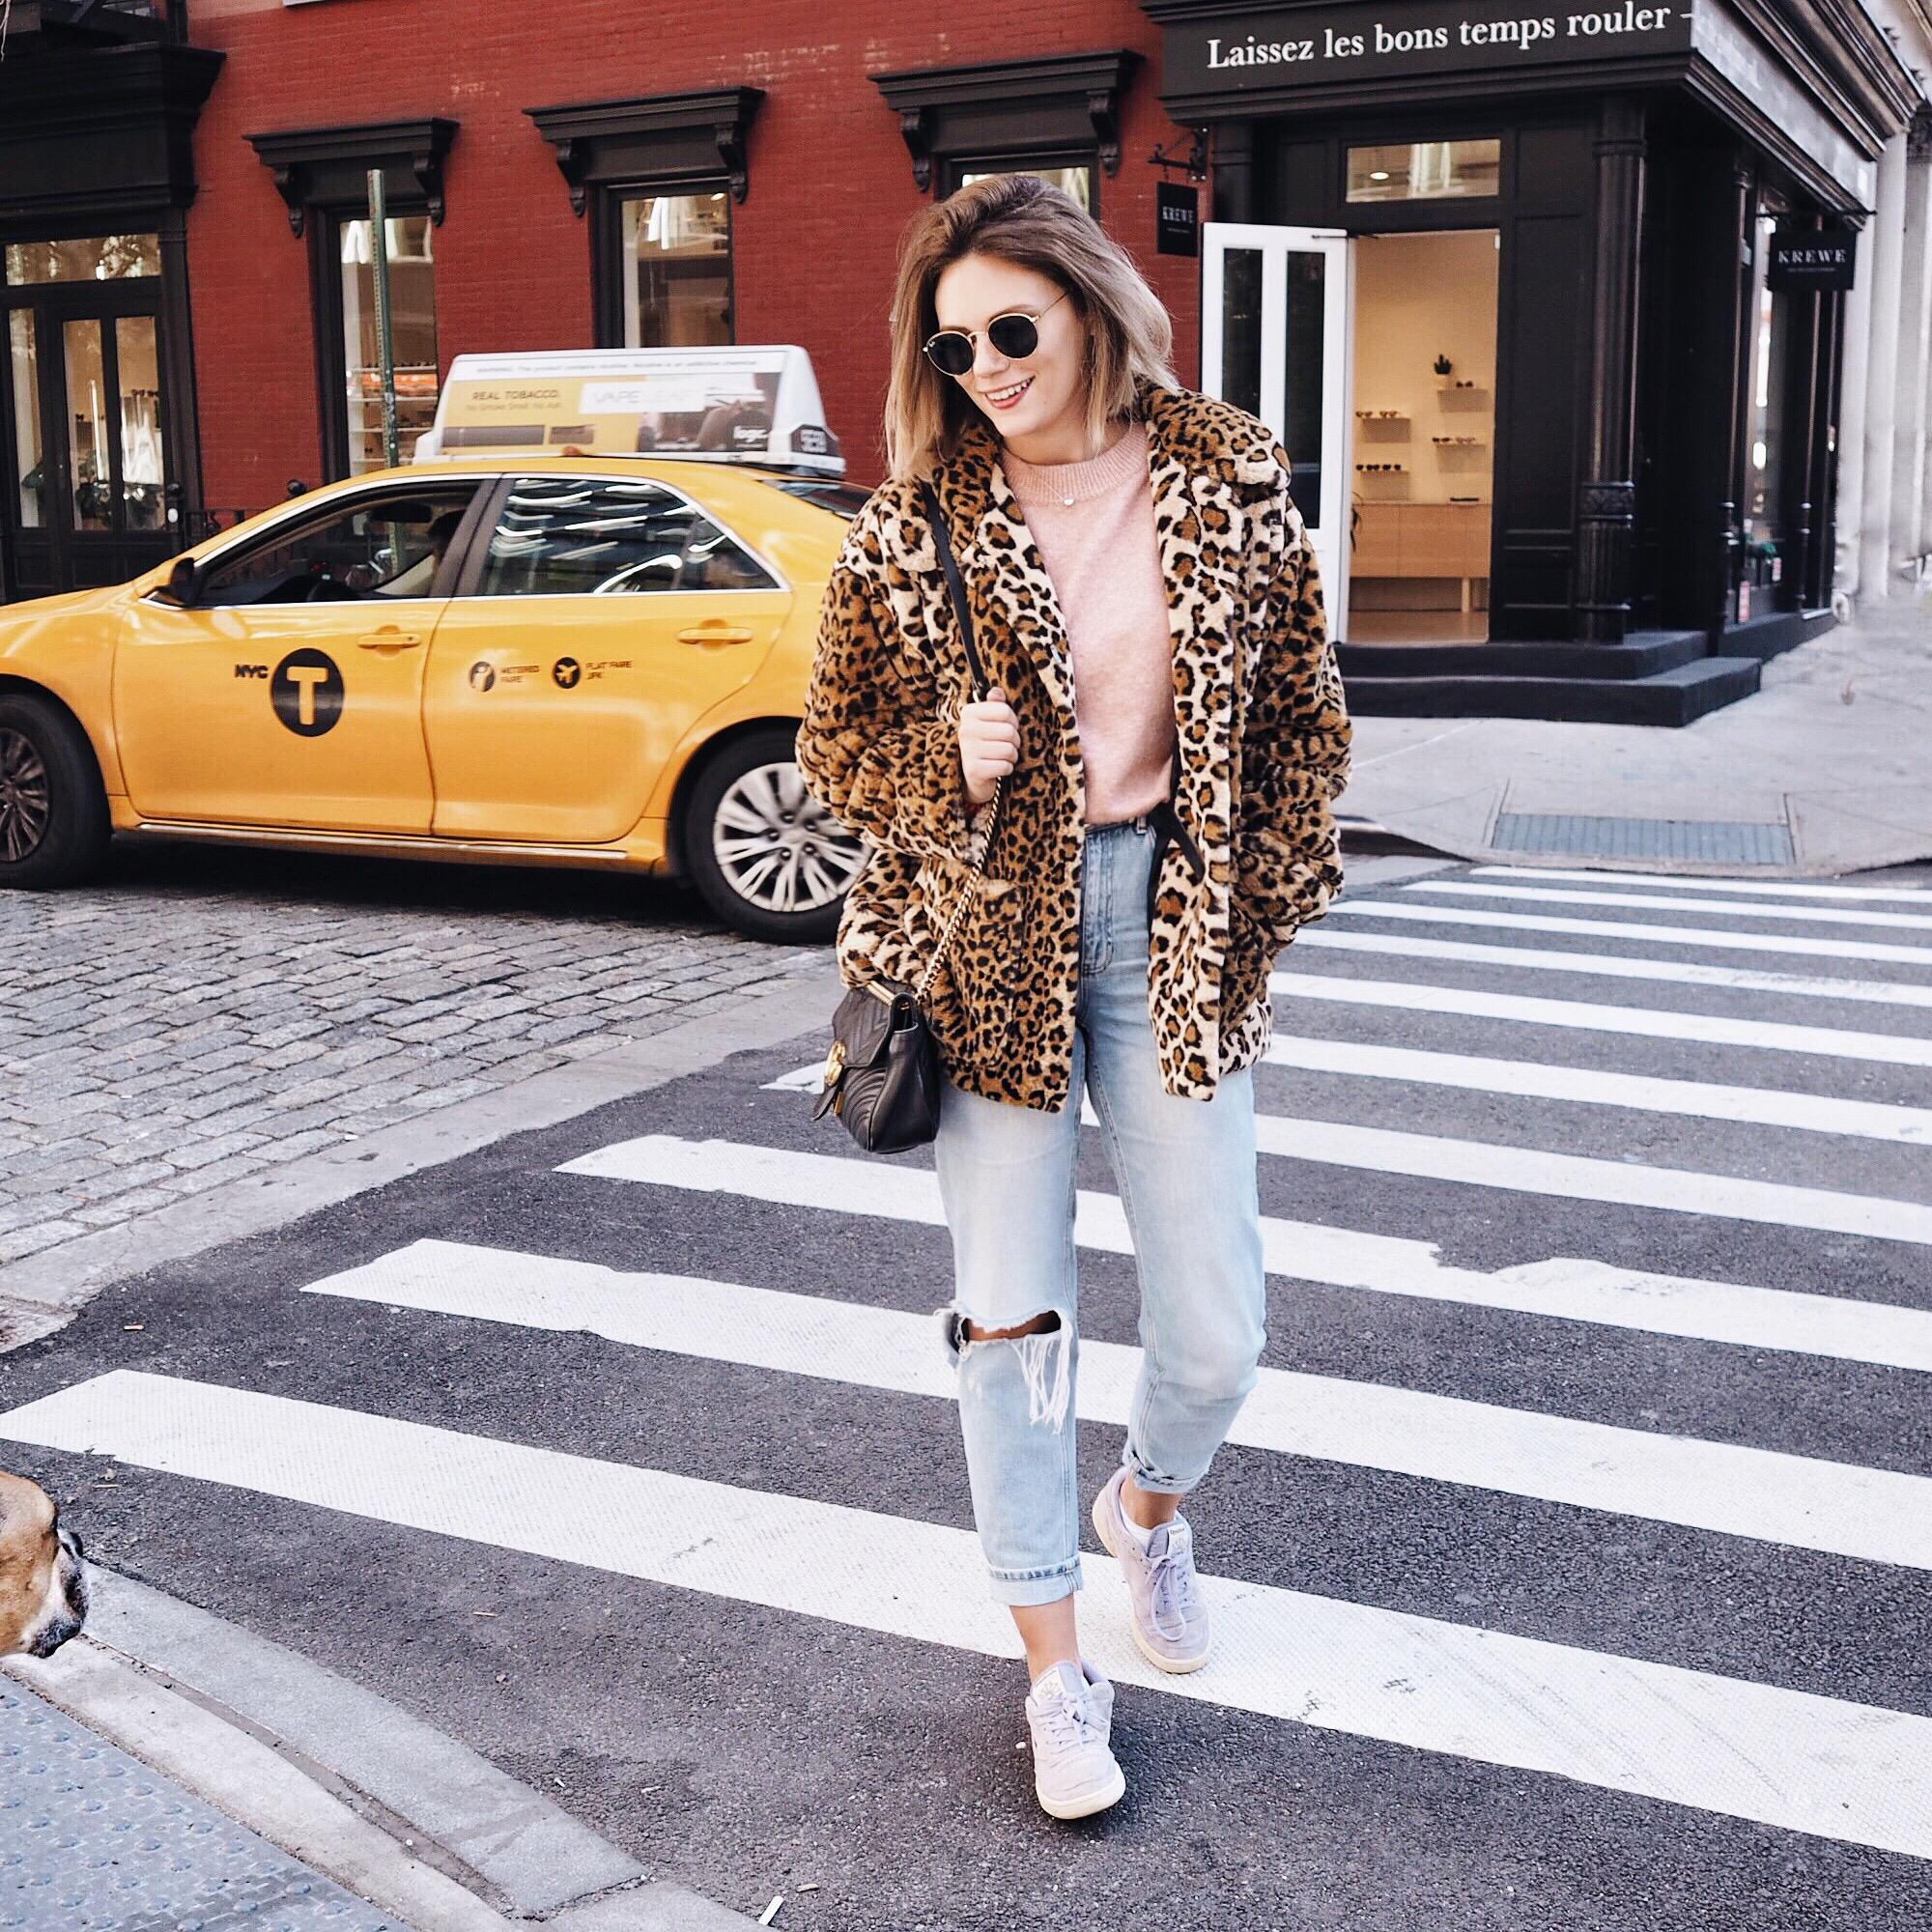 New york cocoa chelsea jesschamilton taxi leopard coat